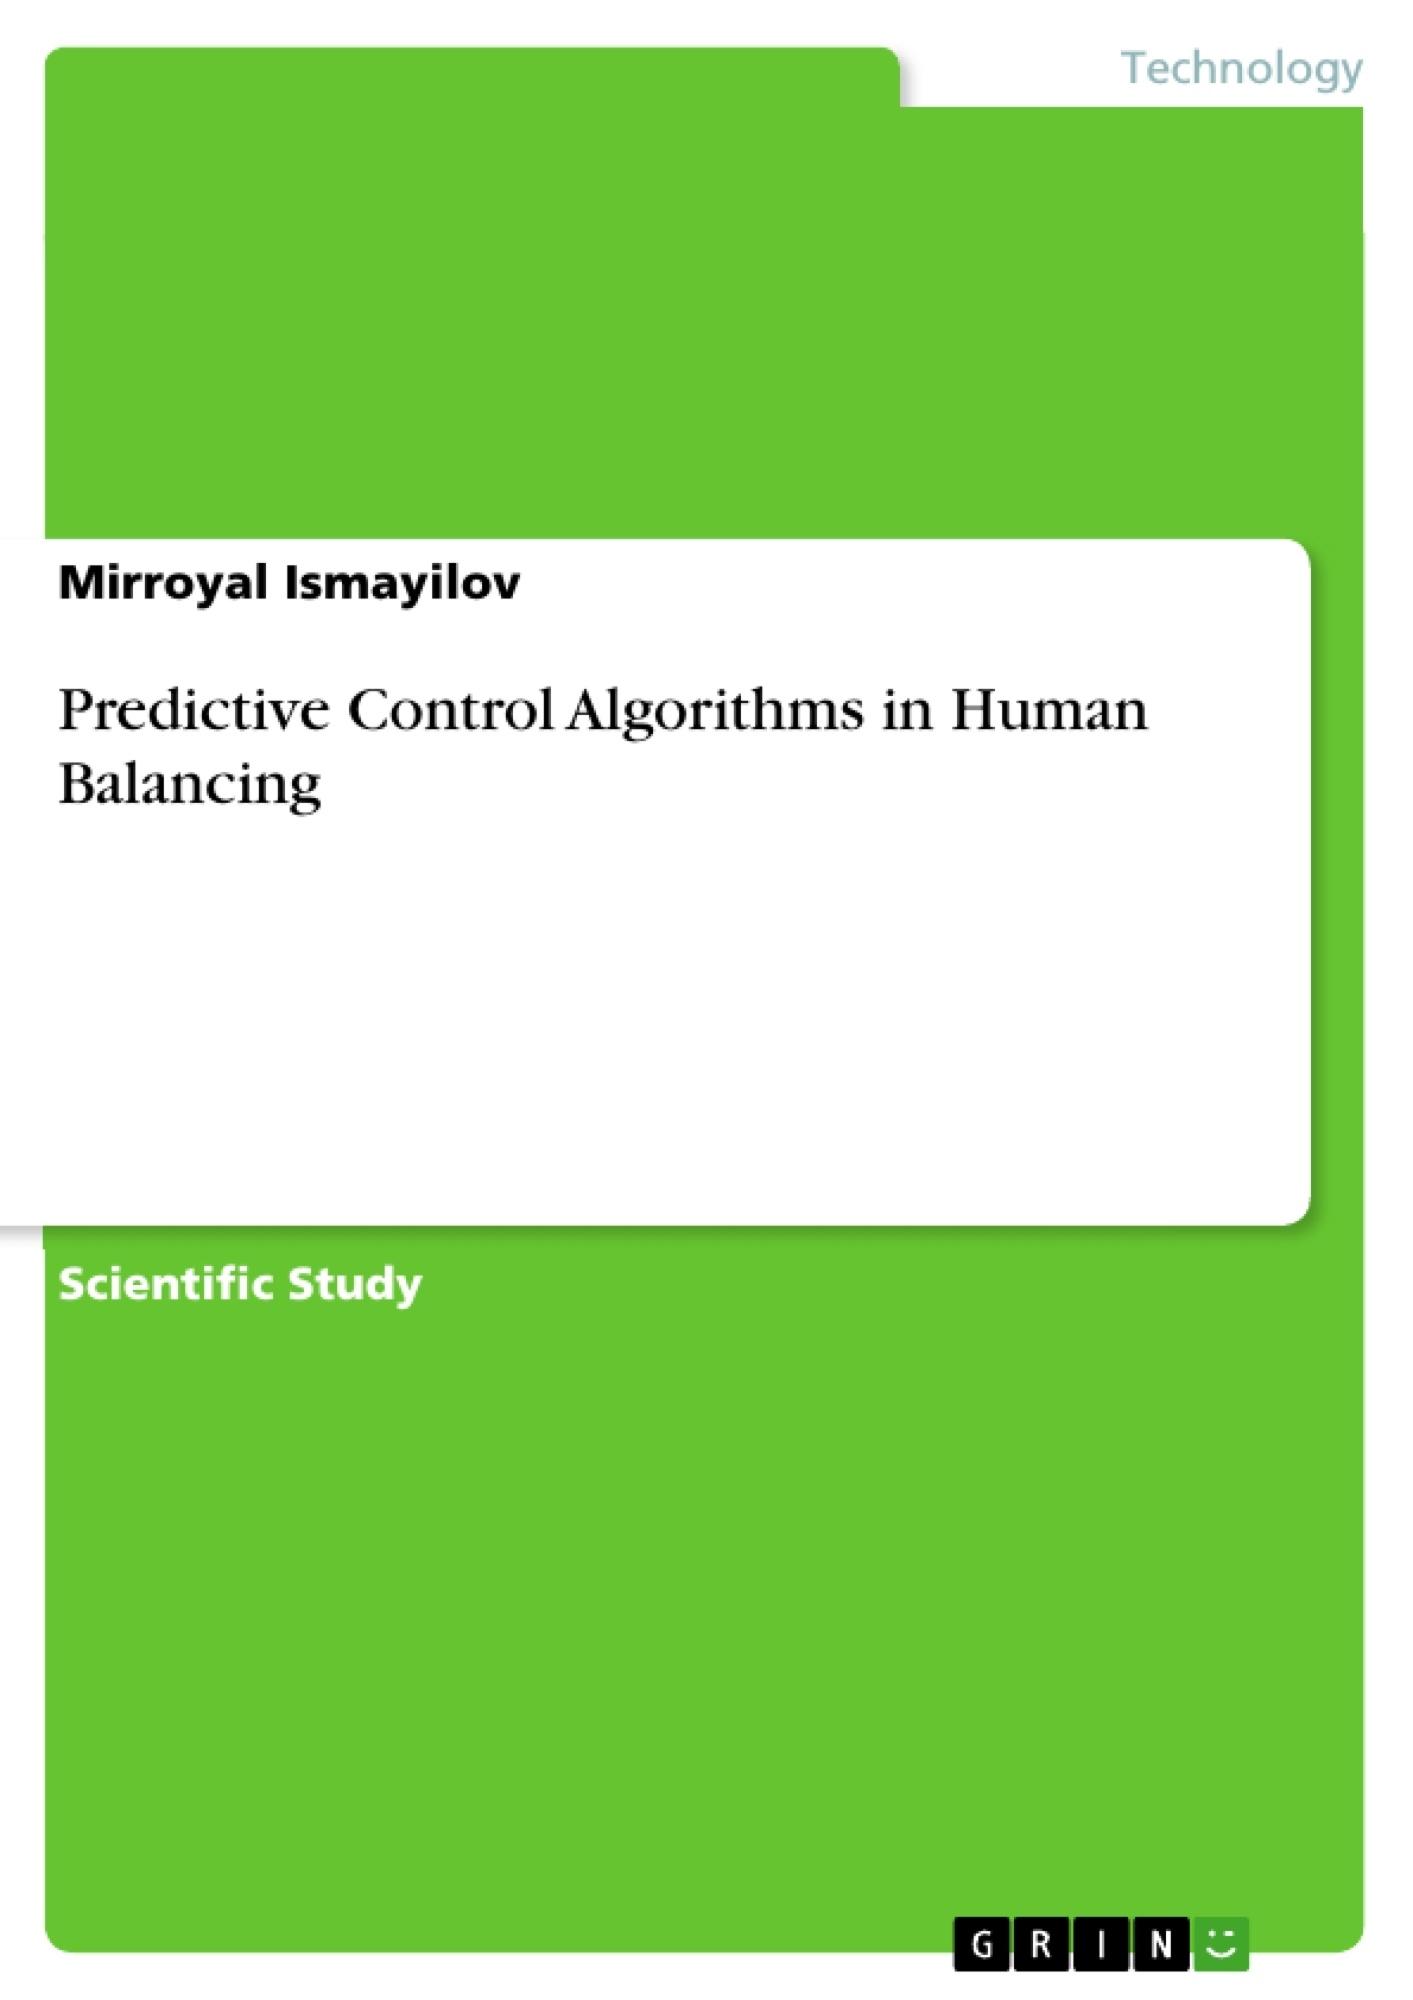 Title: Predictive Control Algorithms in Human Balancing